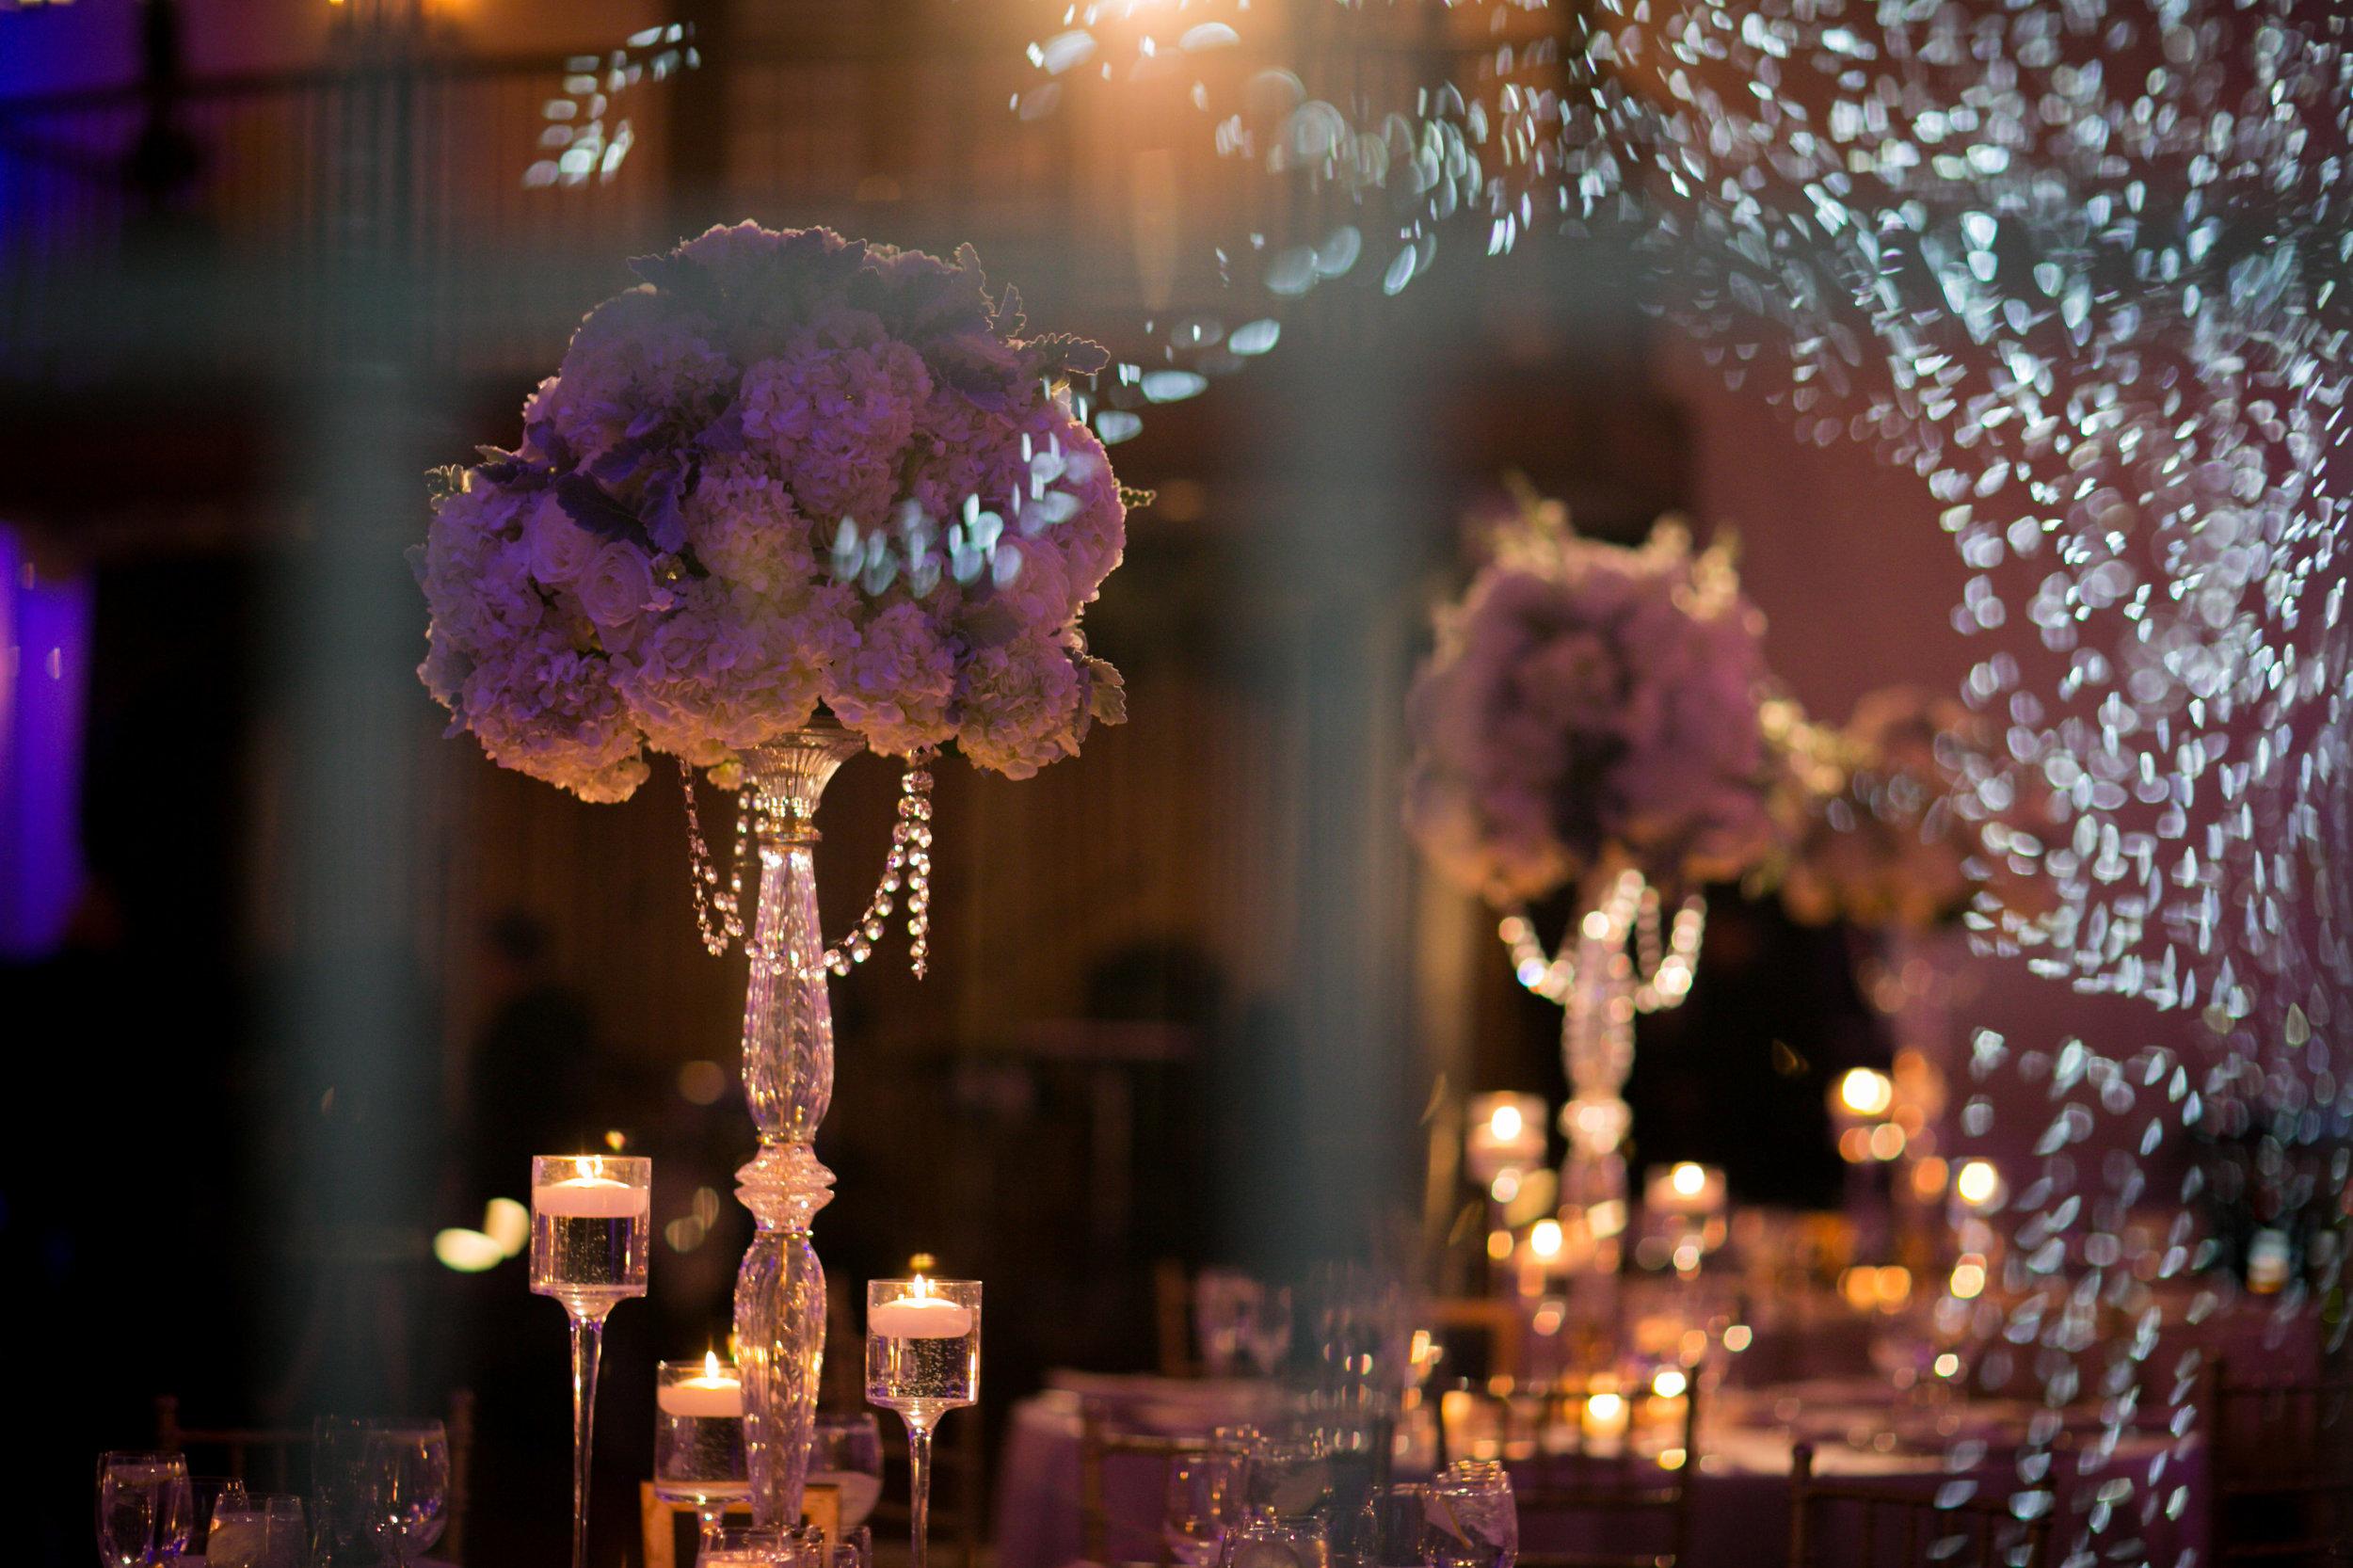 Ceci_New_York_Custom_Invitation_ New_Jersey_Wedding_Luxury_Personalized_Ceci_Style_Bride_Foil_Stamping63.jpg